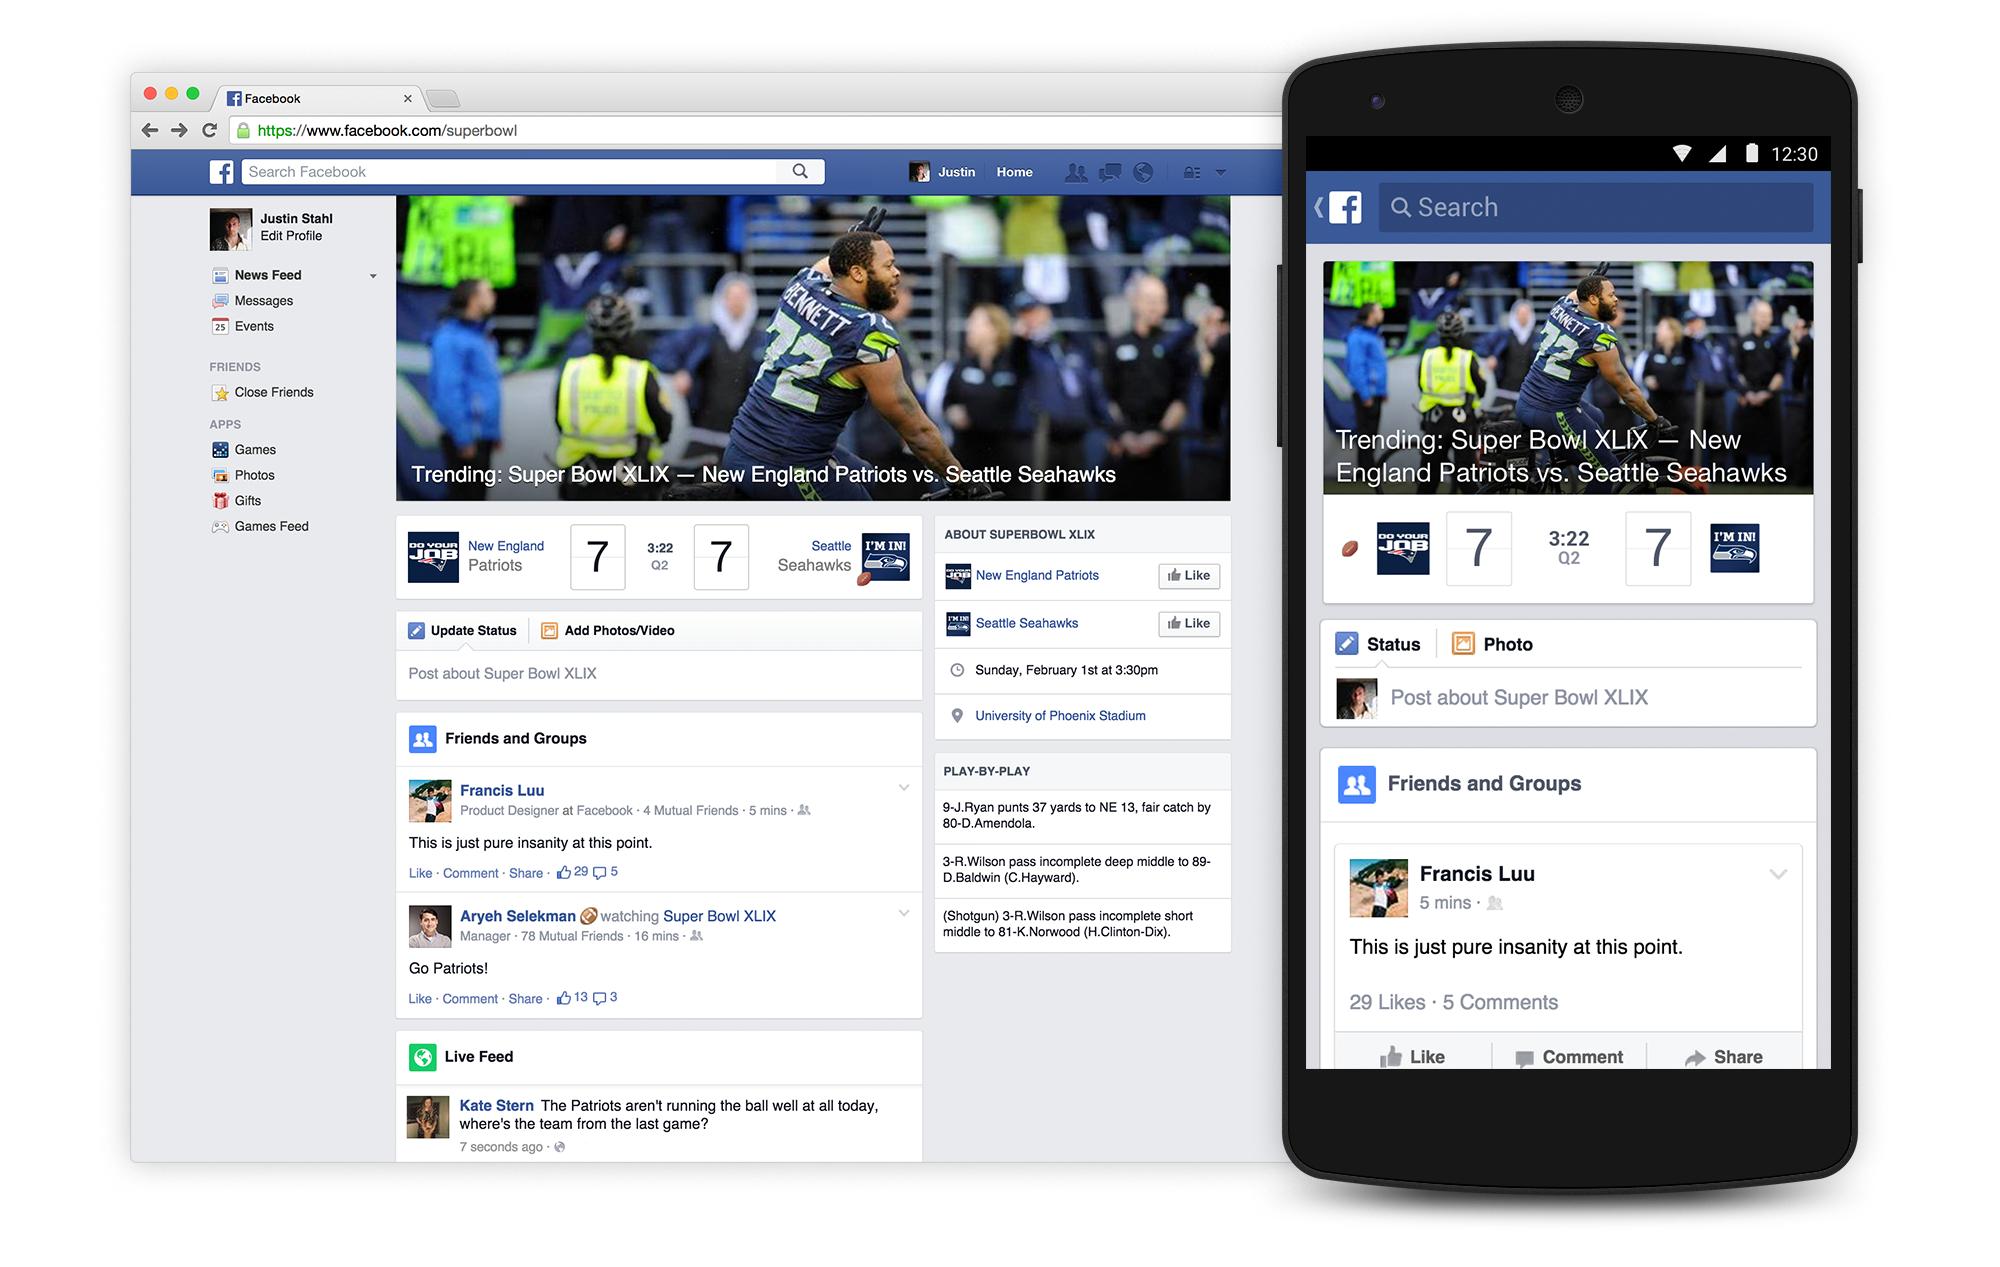 Facebook Super Bowl XLIX experience